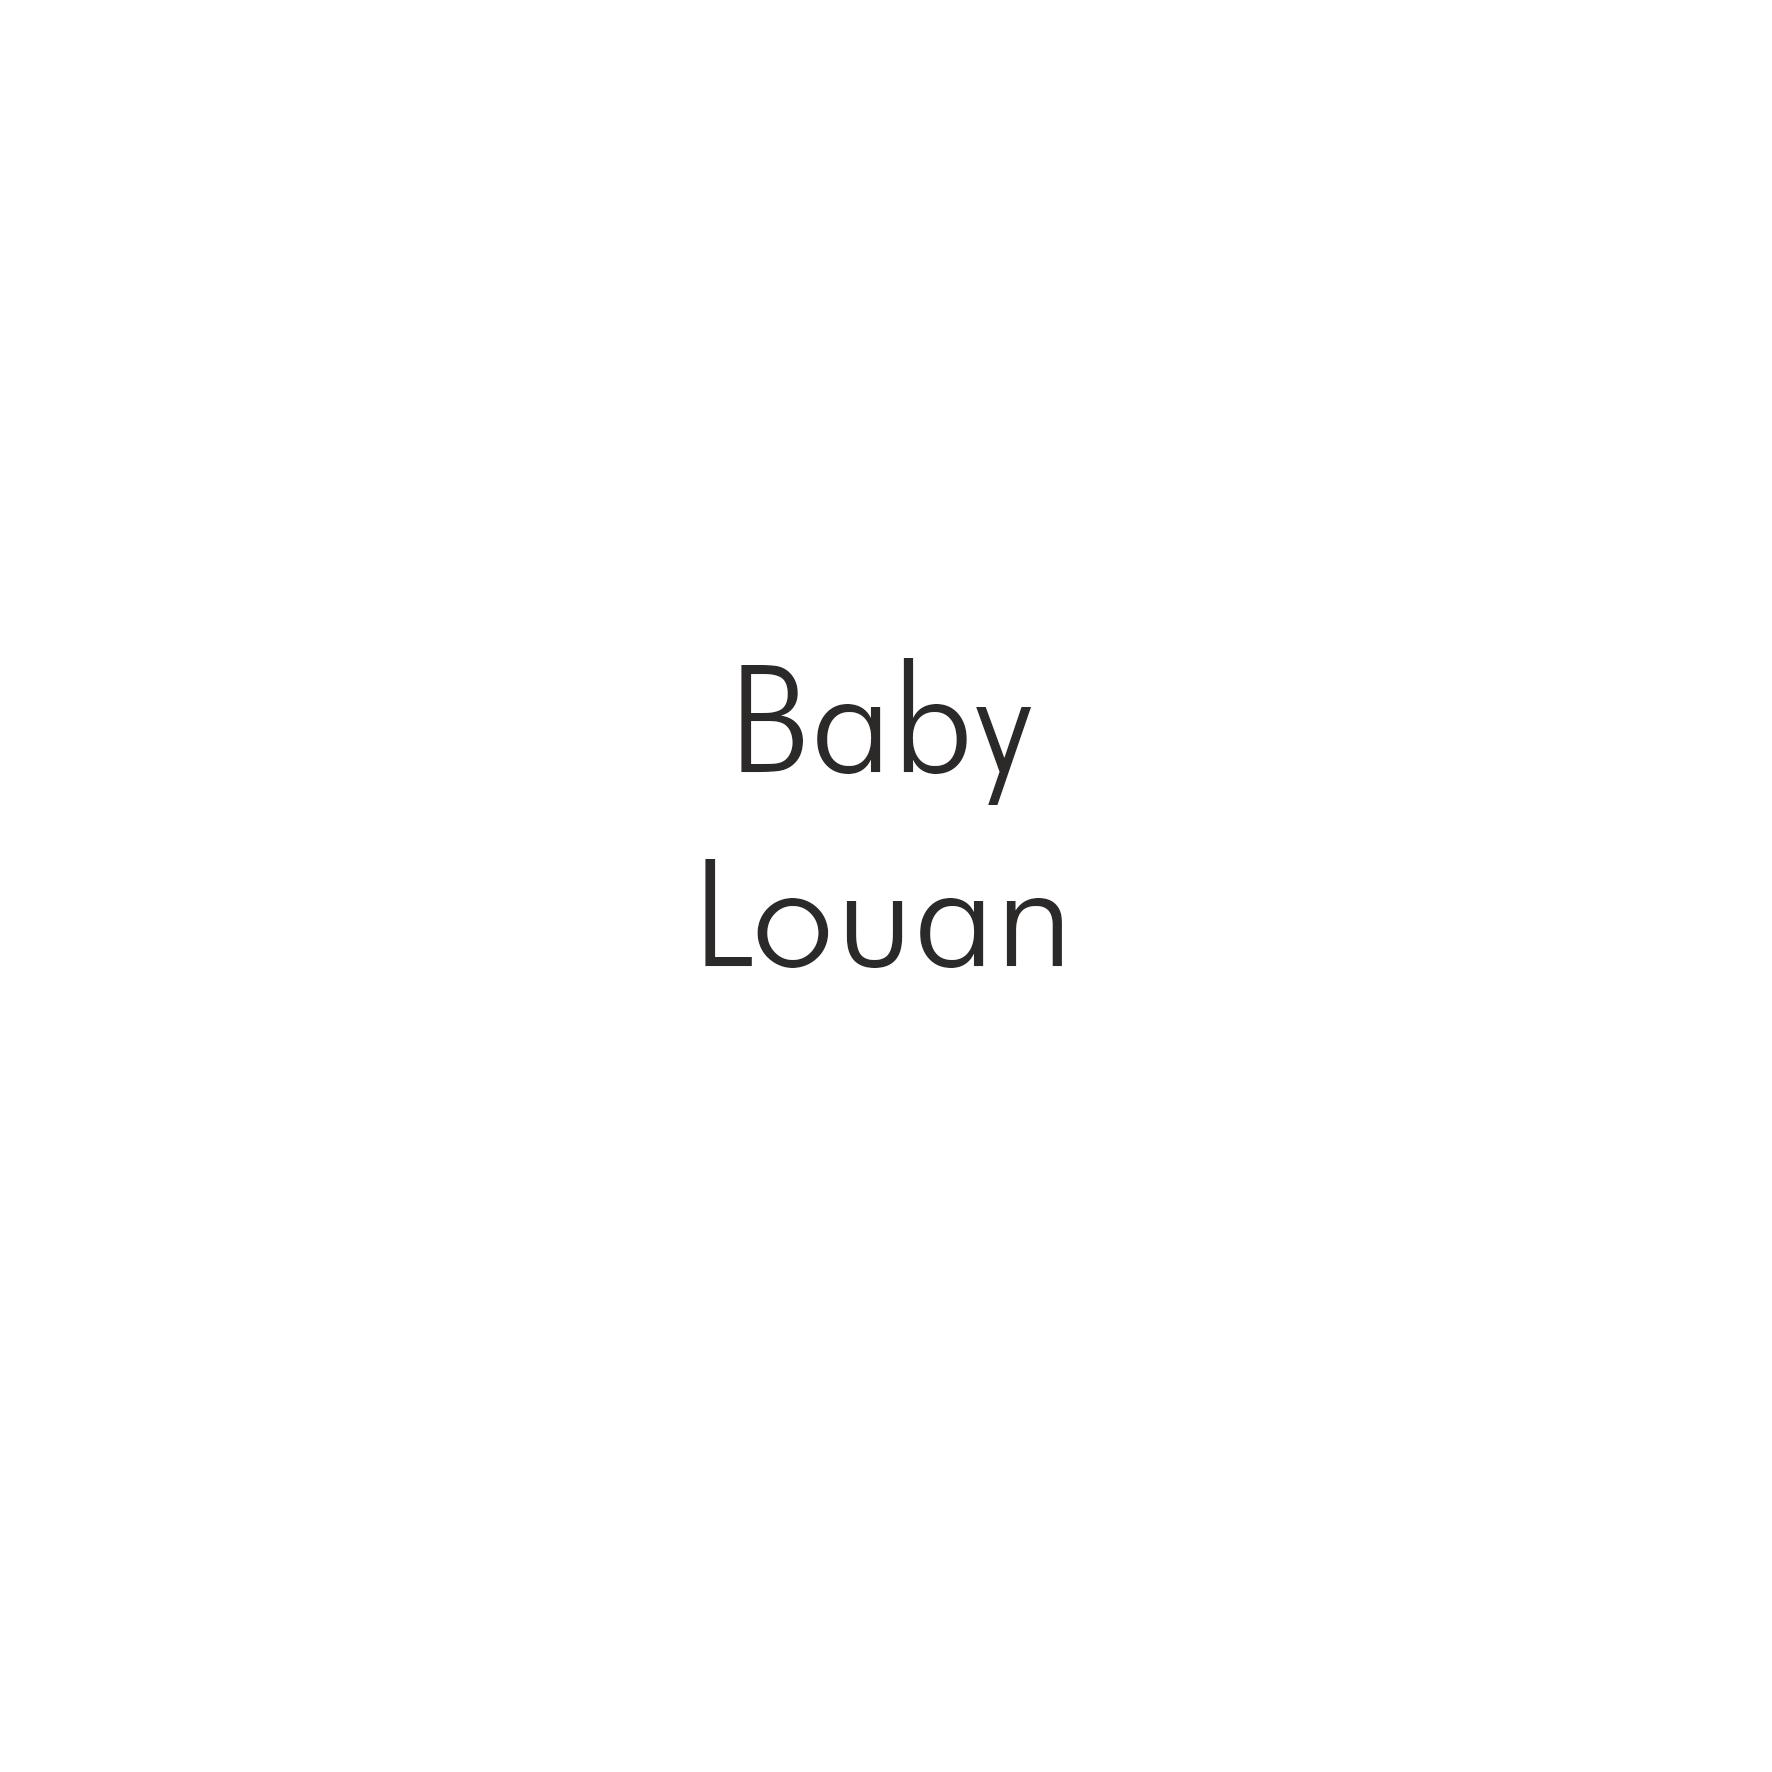 Baby Louan.png